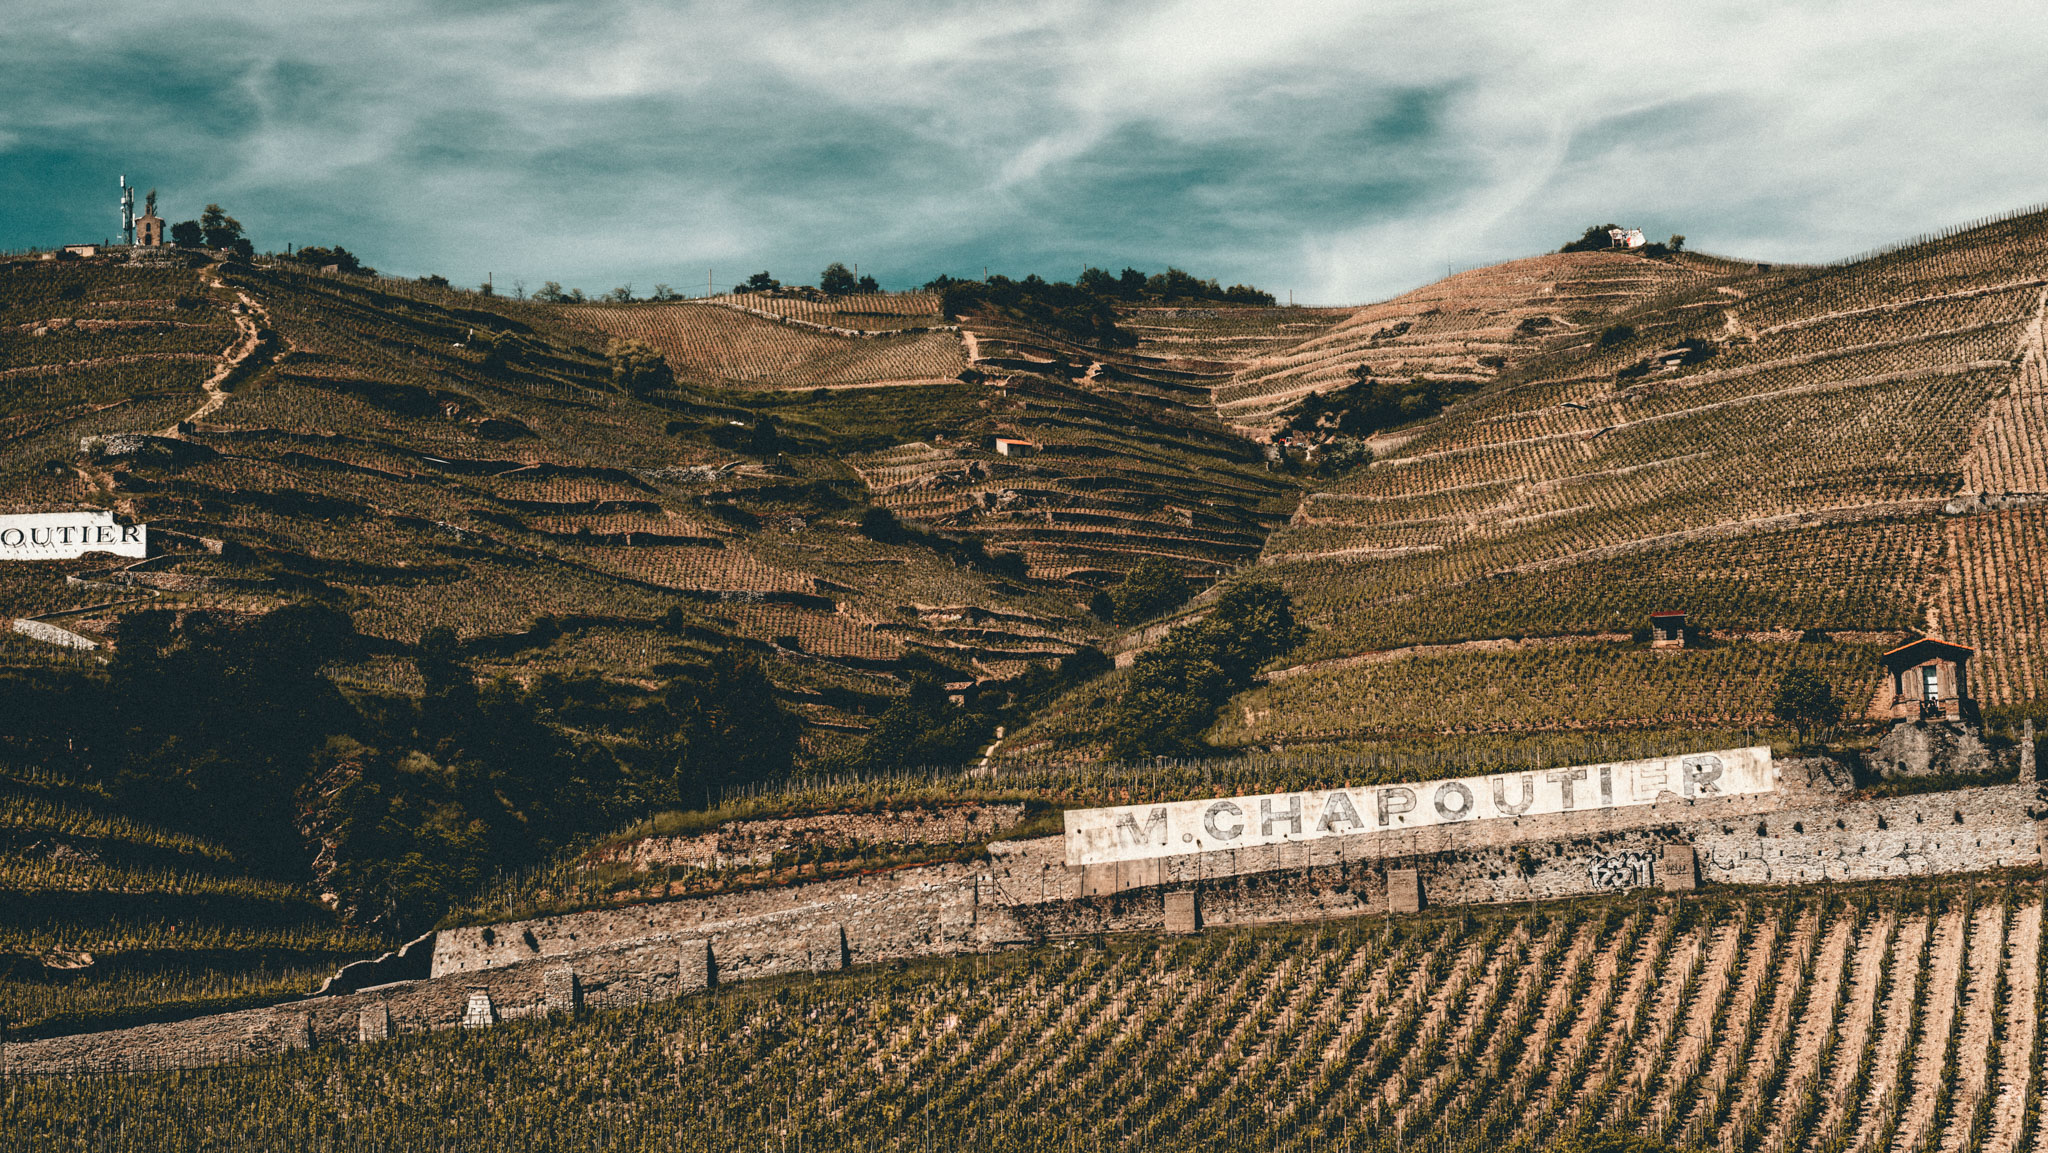 France : Northern Rhone : l'Ermite vineyard, Hermitage hill